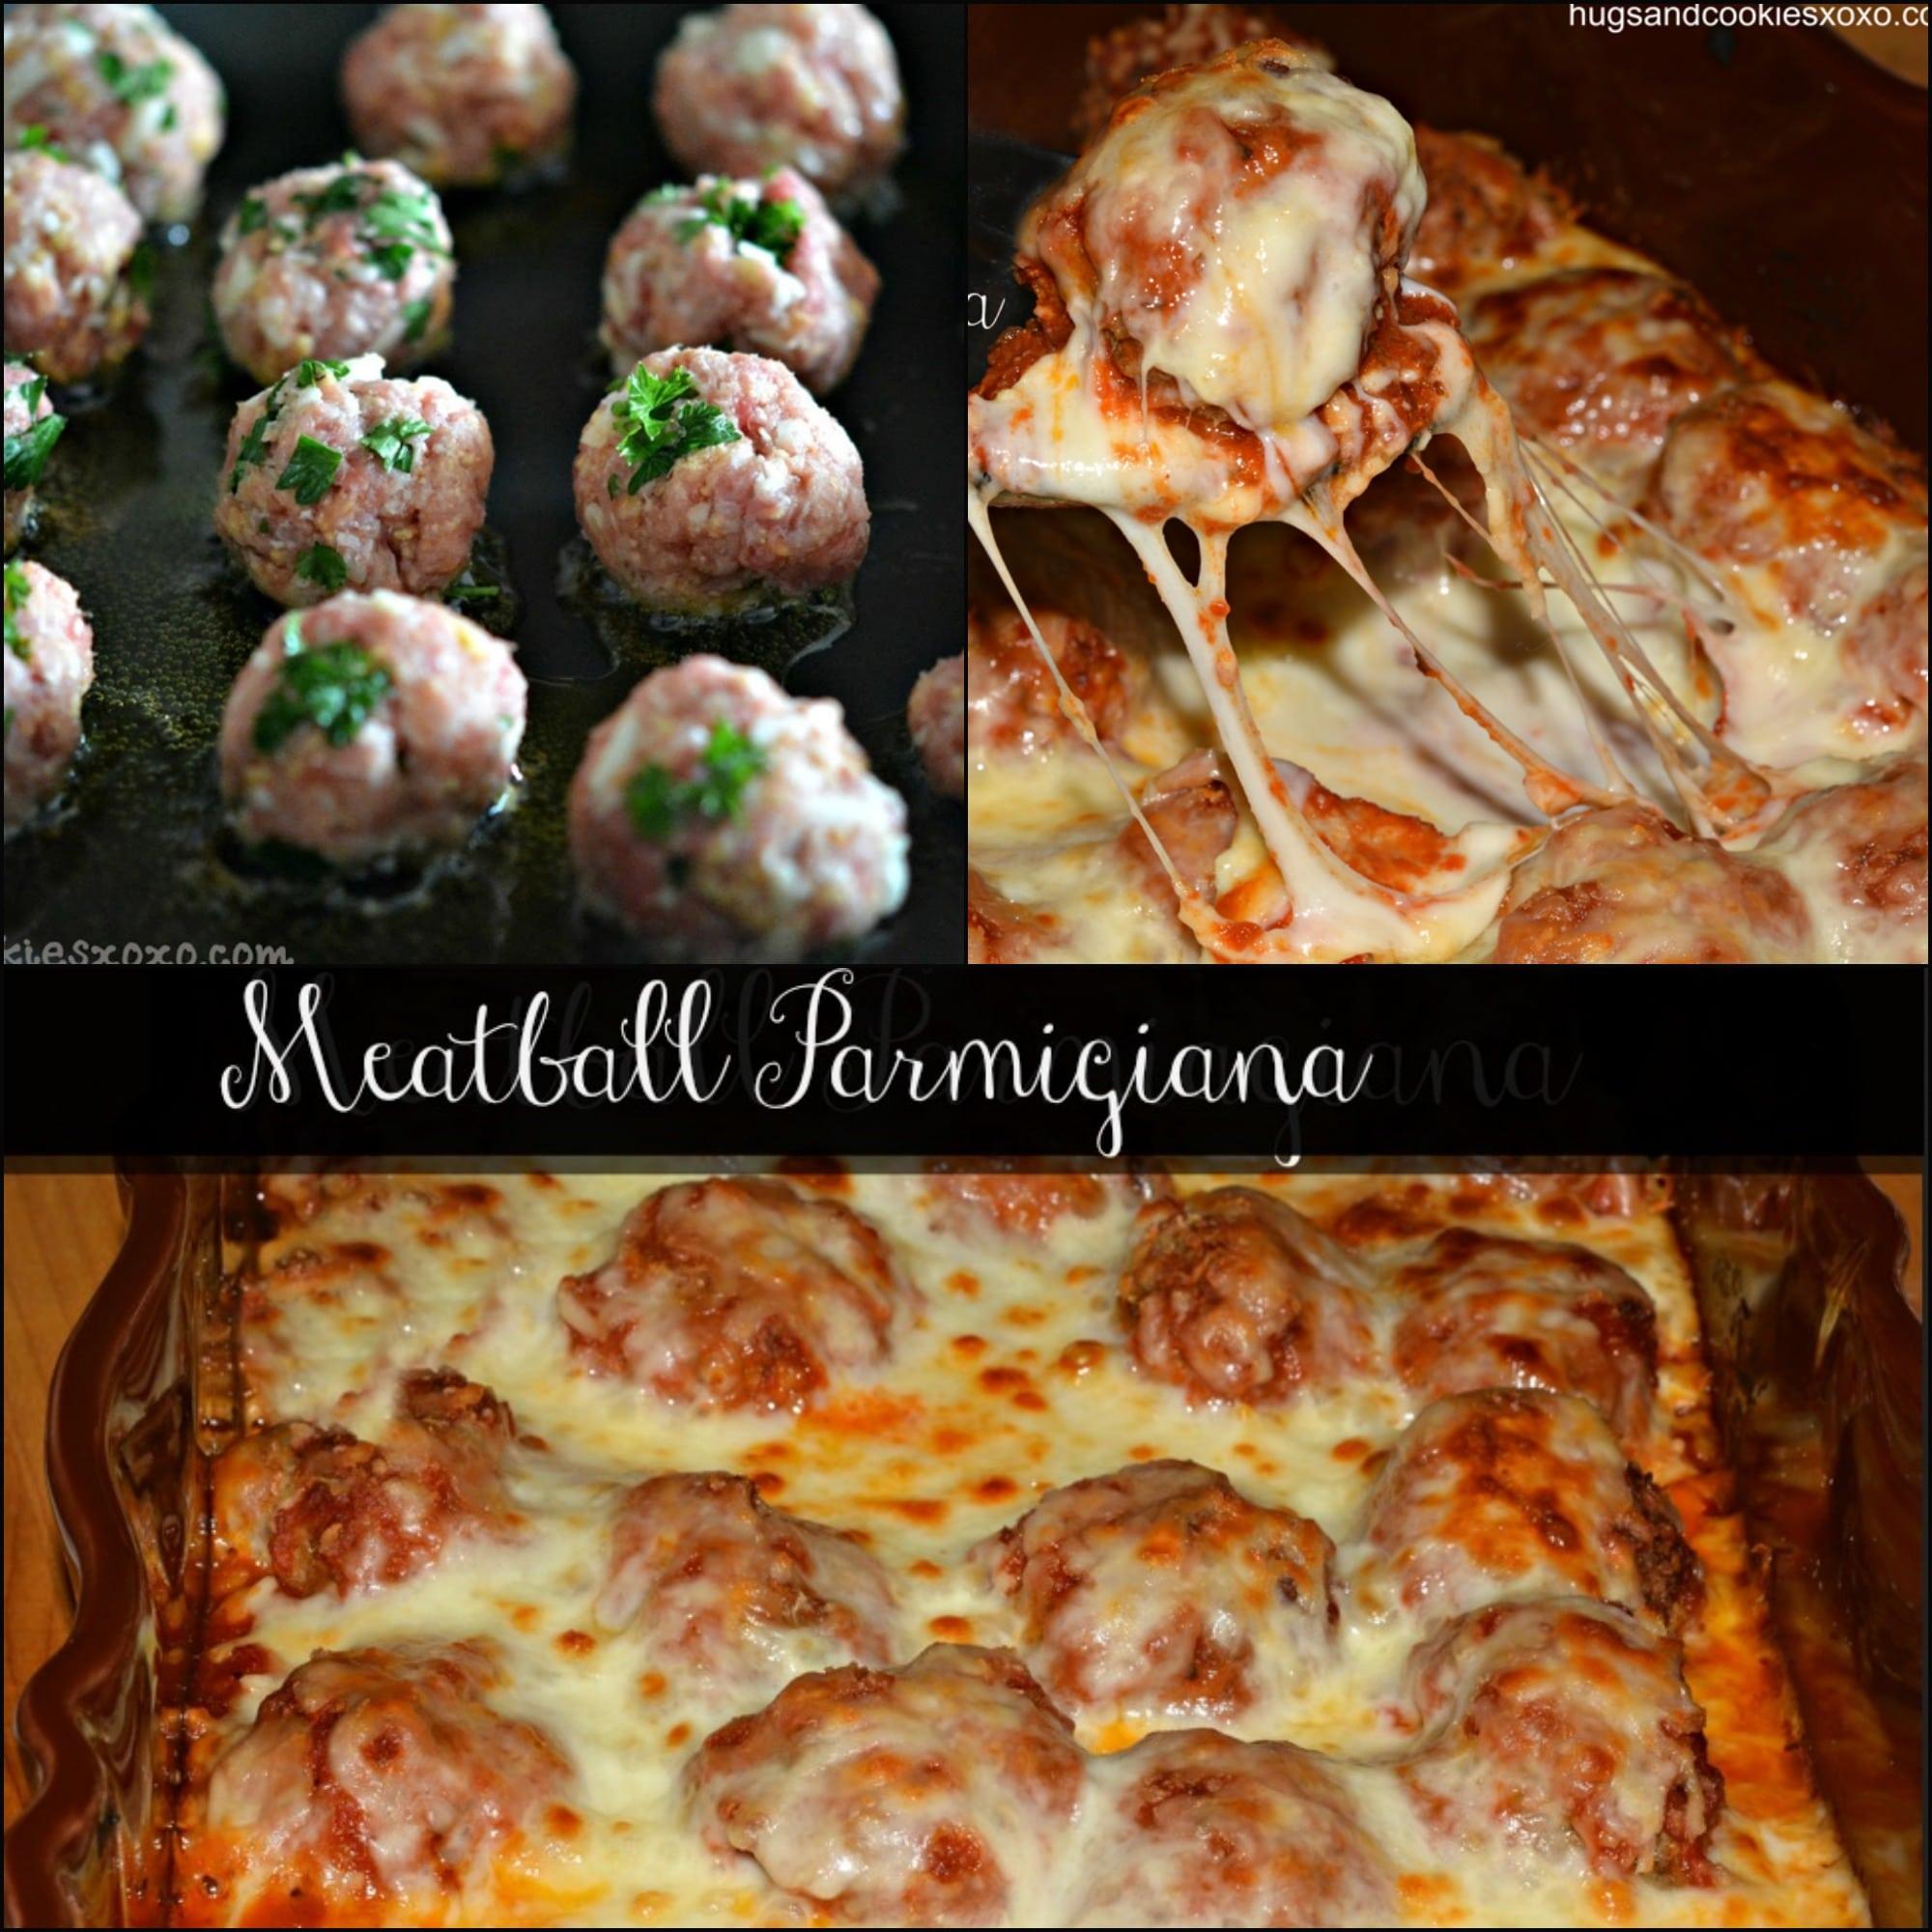 Baked Meatball Parmigiana Hugs And Cookies Xoxo